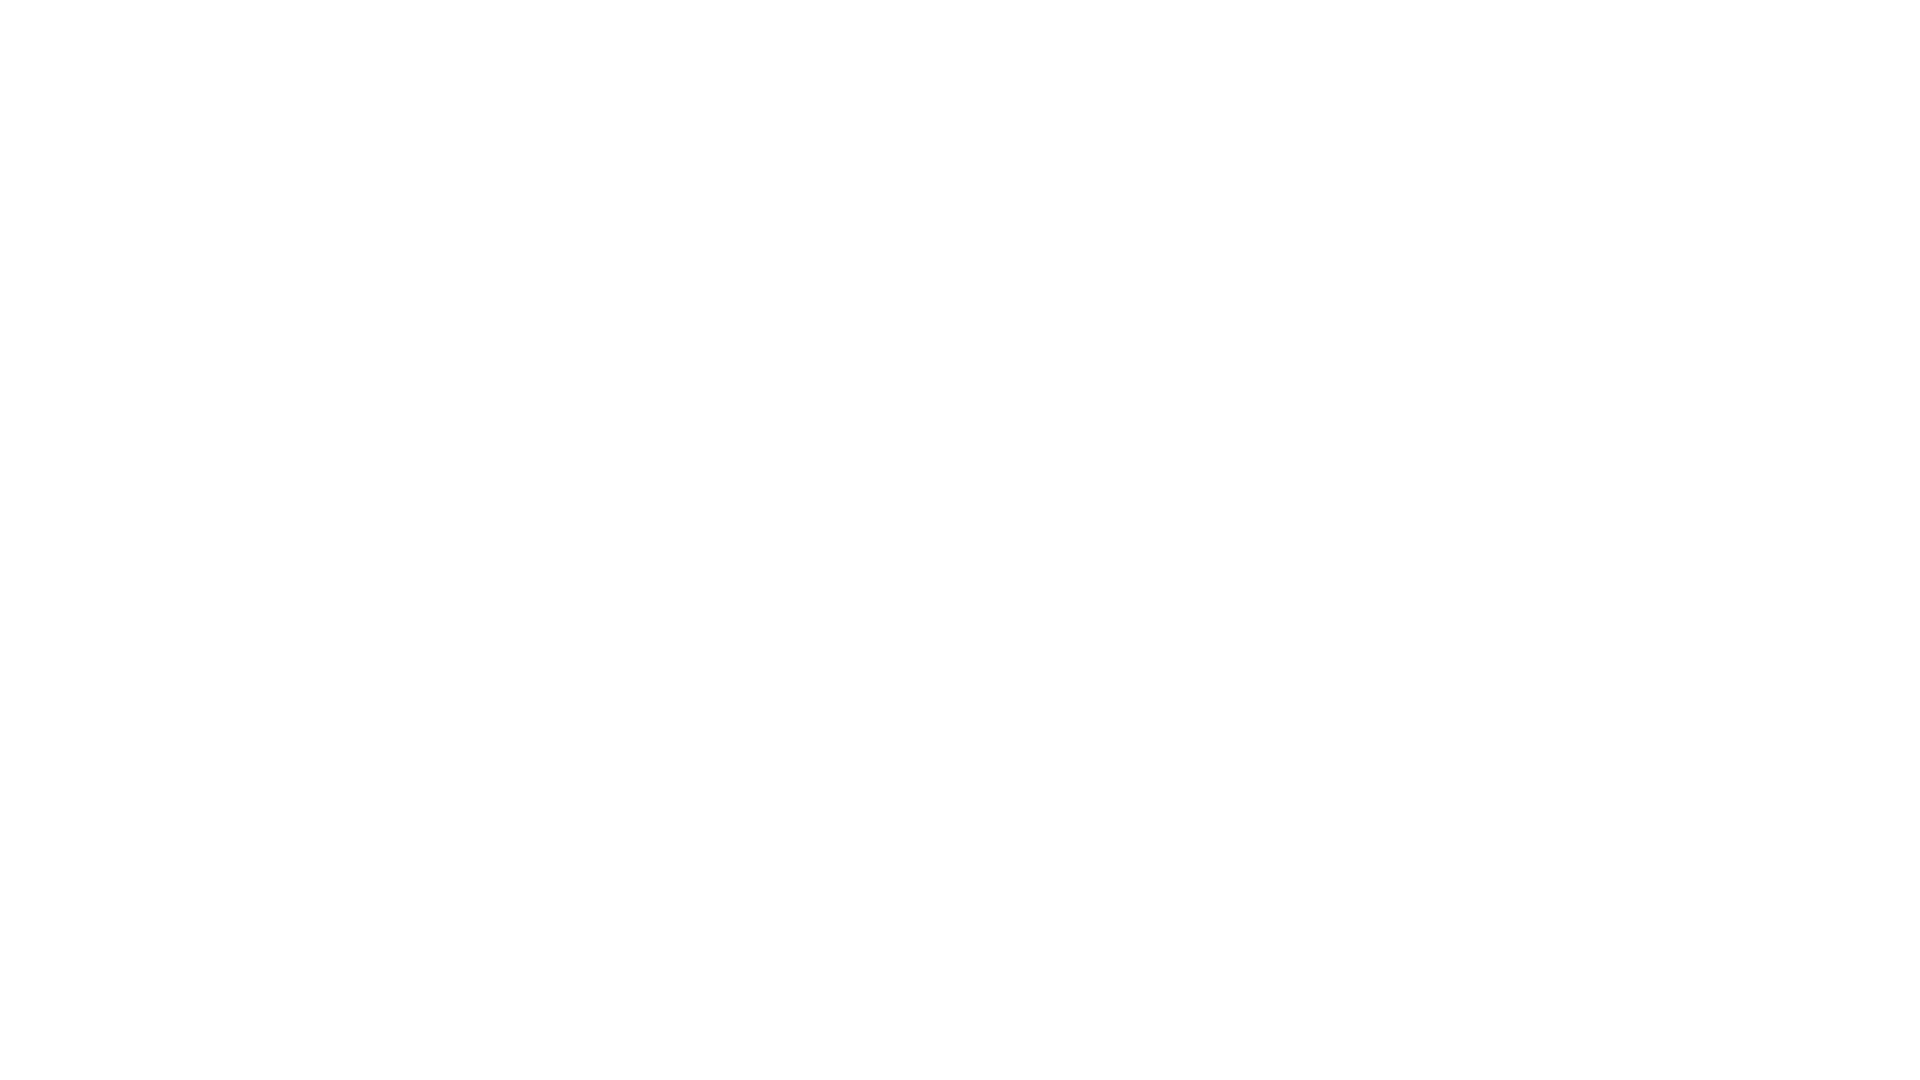 Urban One - Representing Black America